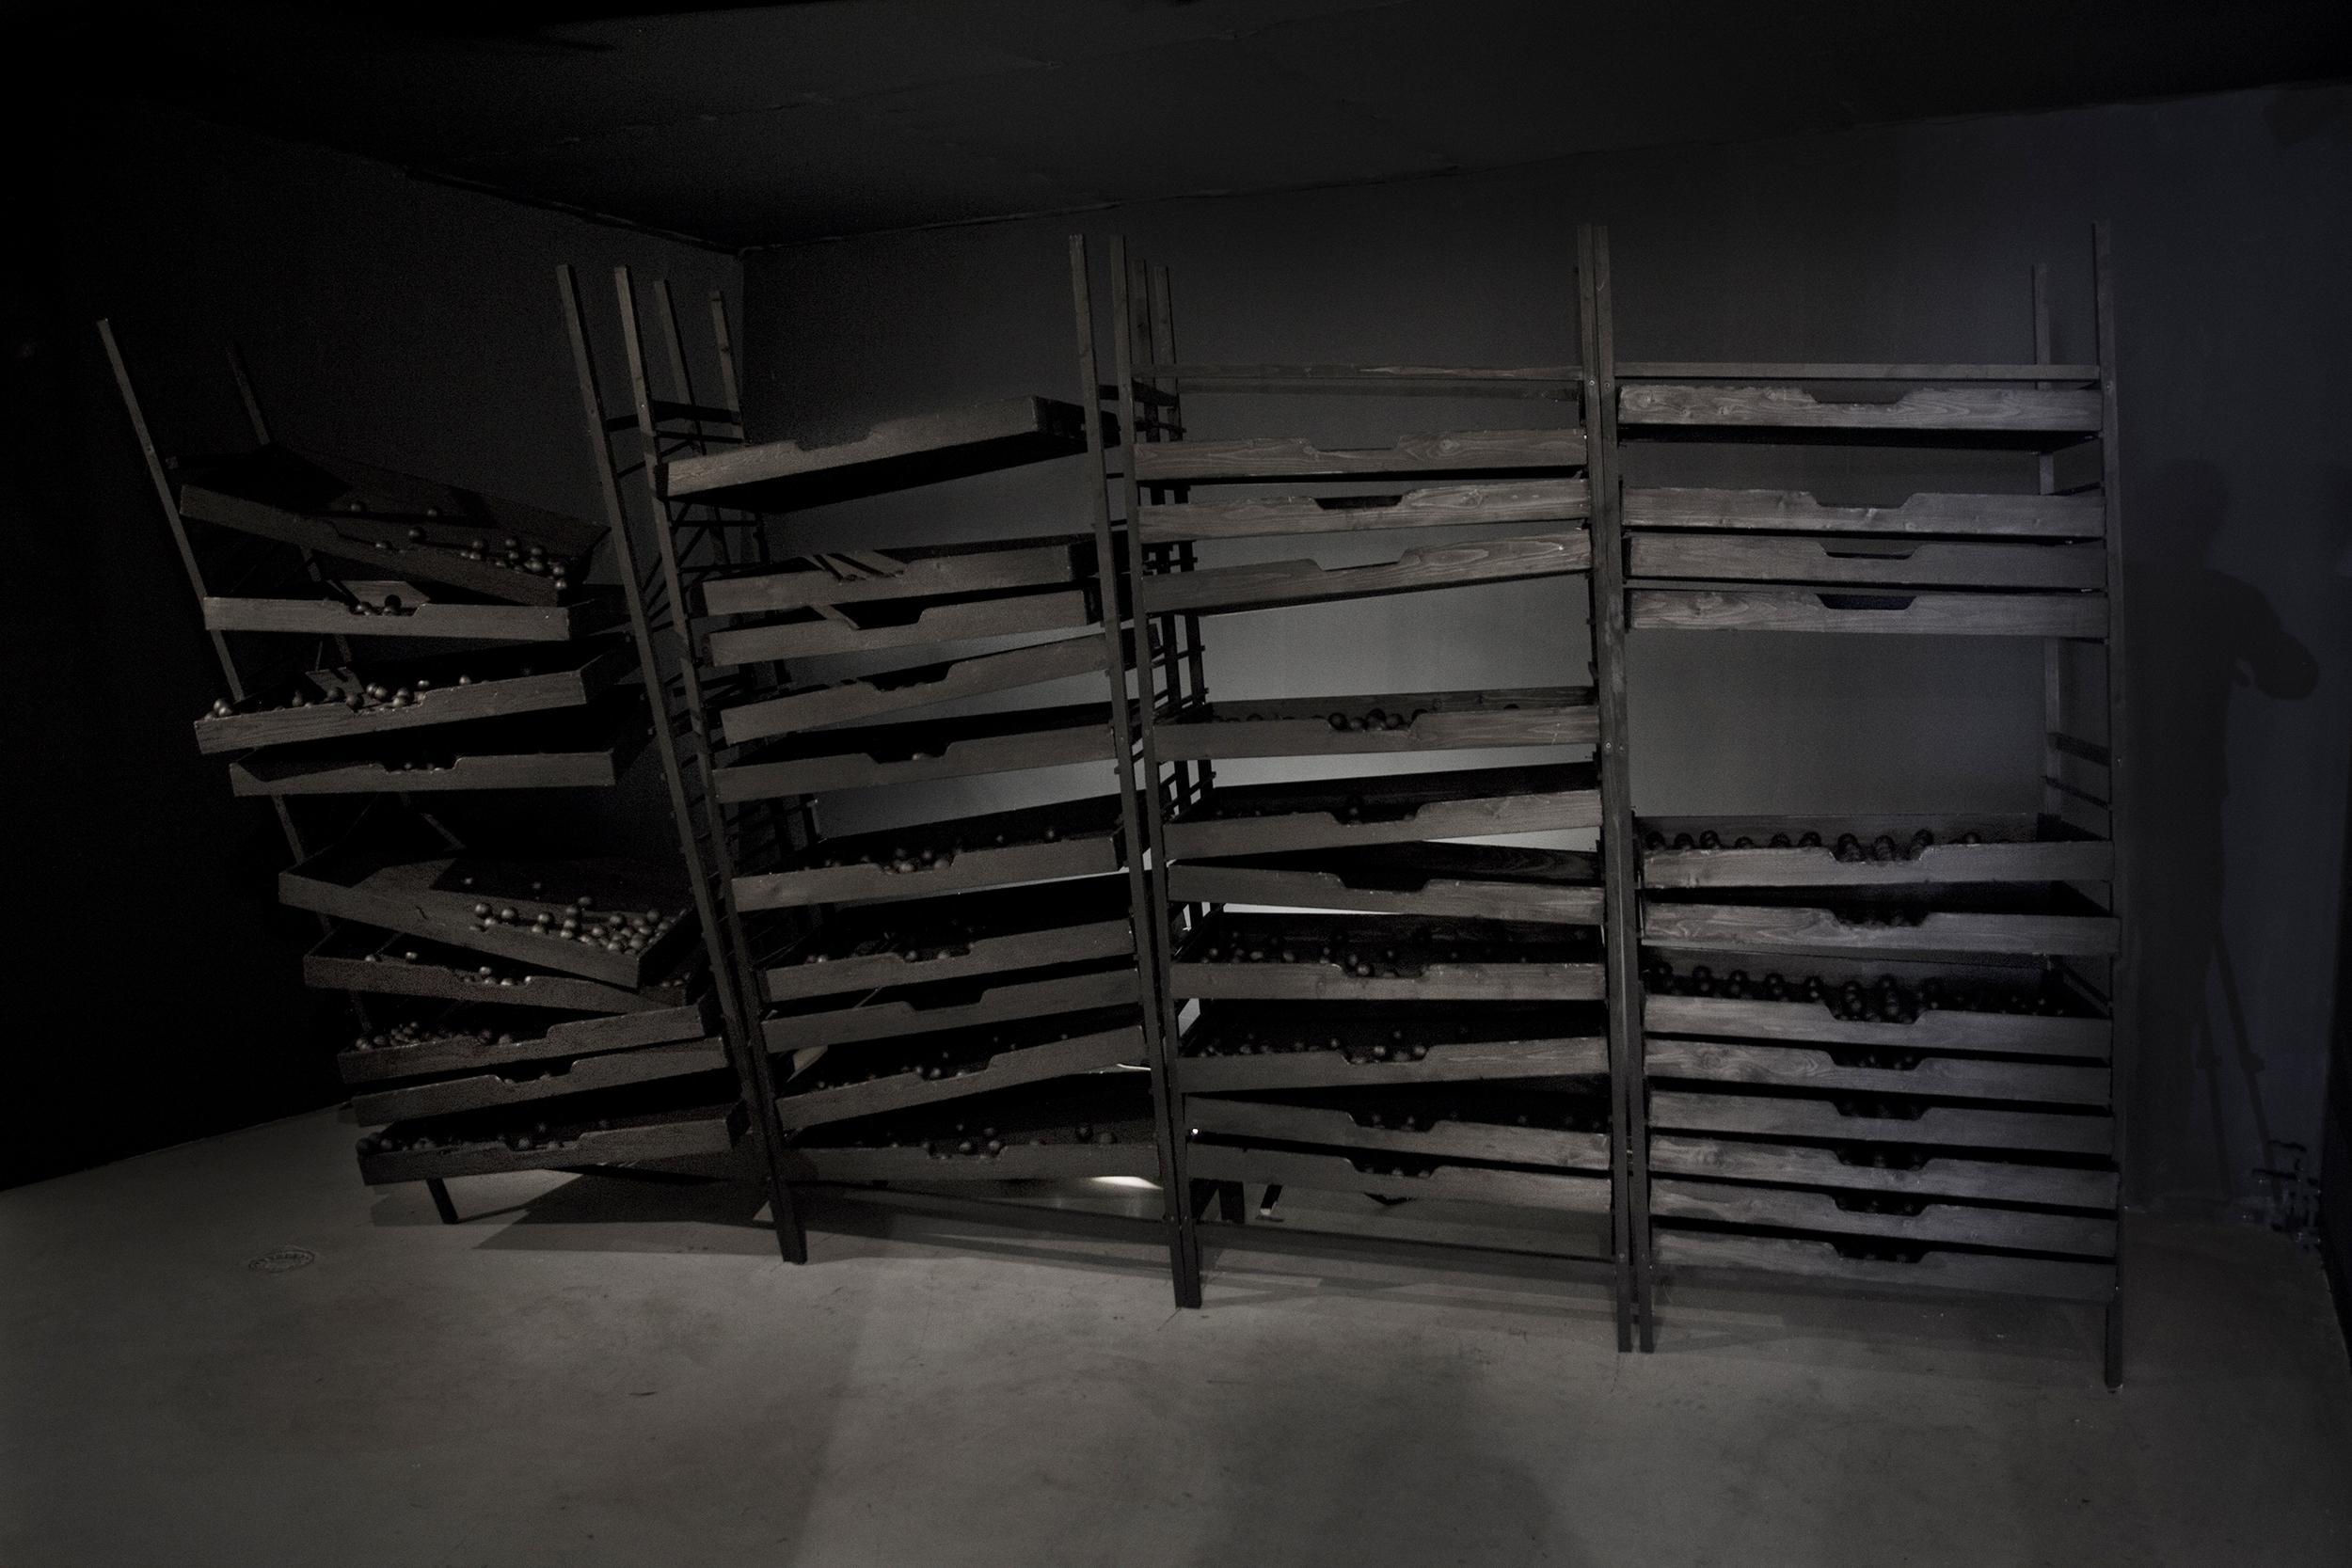 2013 | 400 x 200 x 100cm